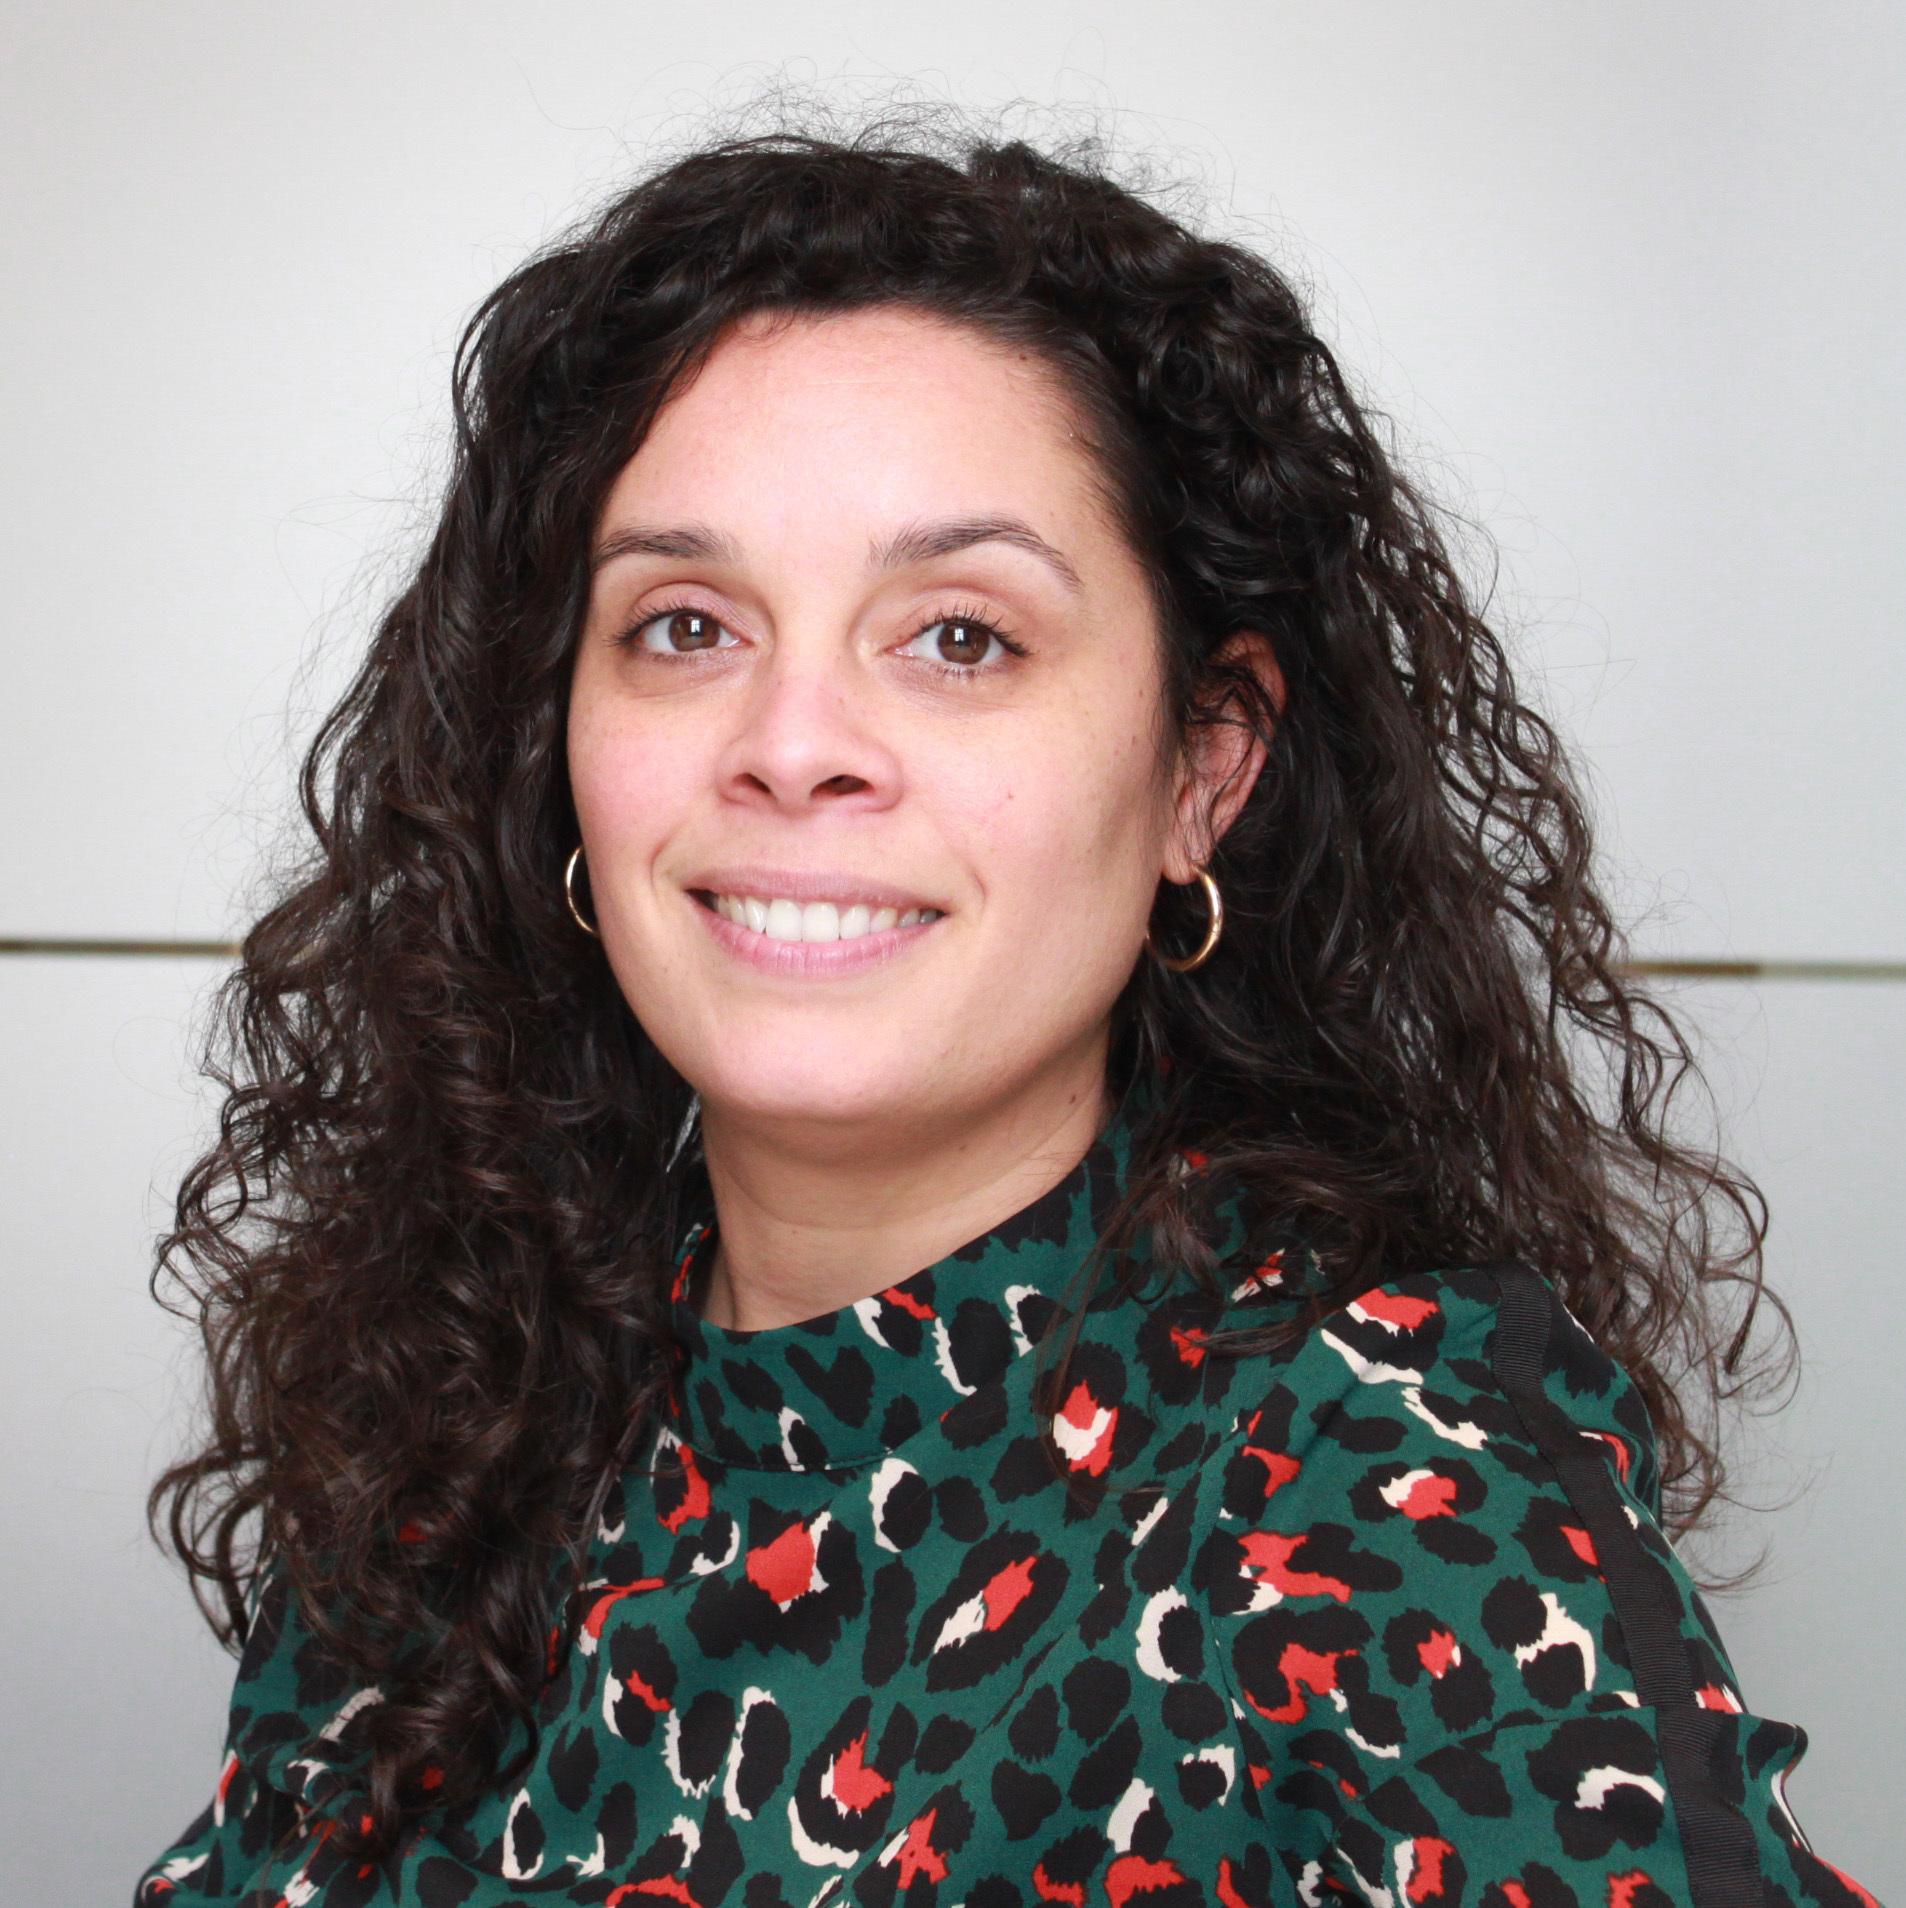 Leticia Vandepitte